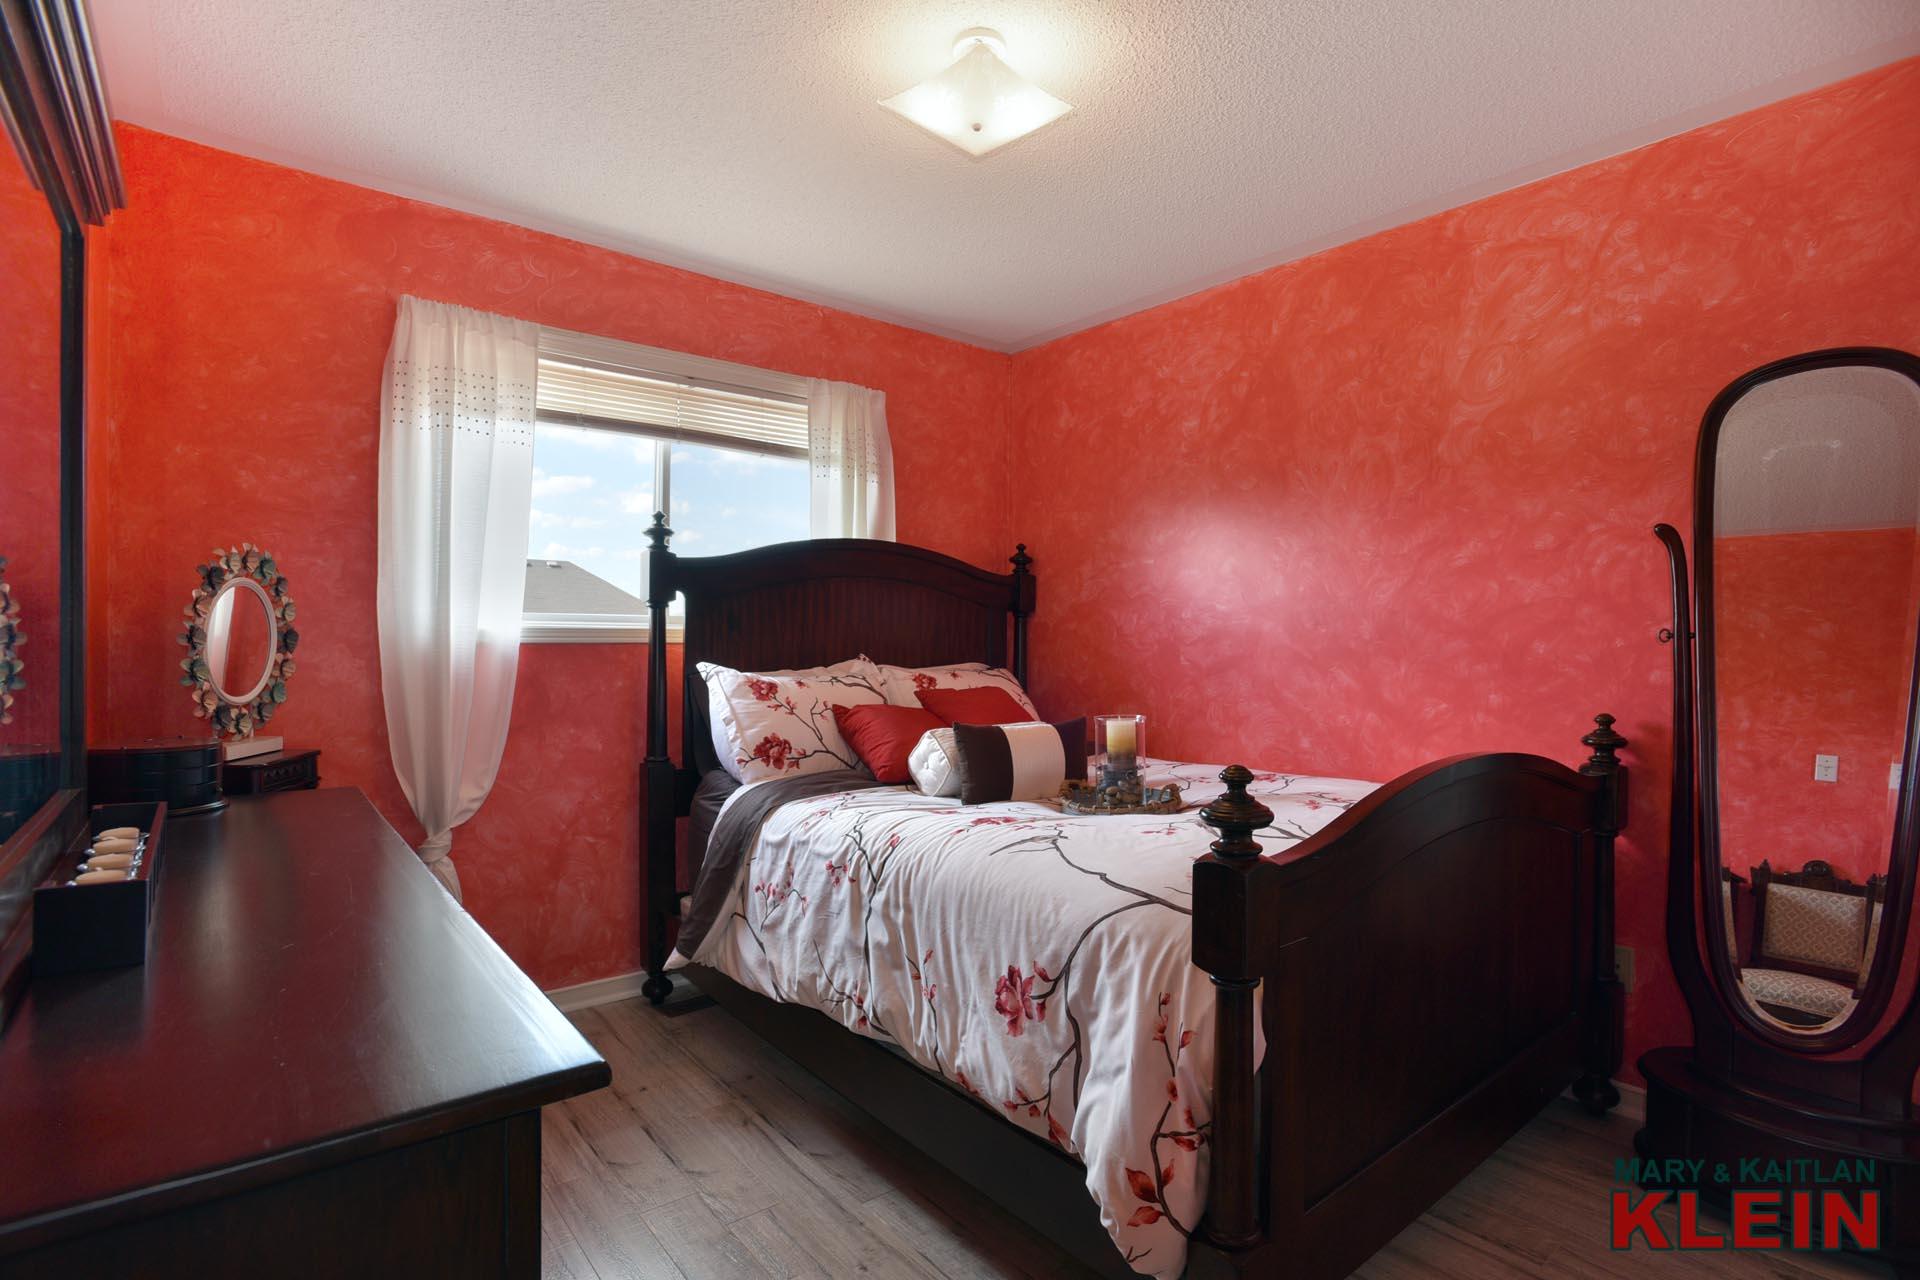 Bedroom 3 - Laminate